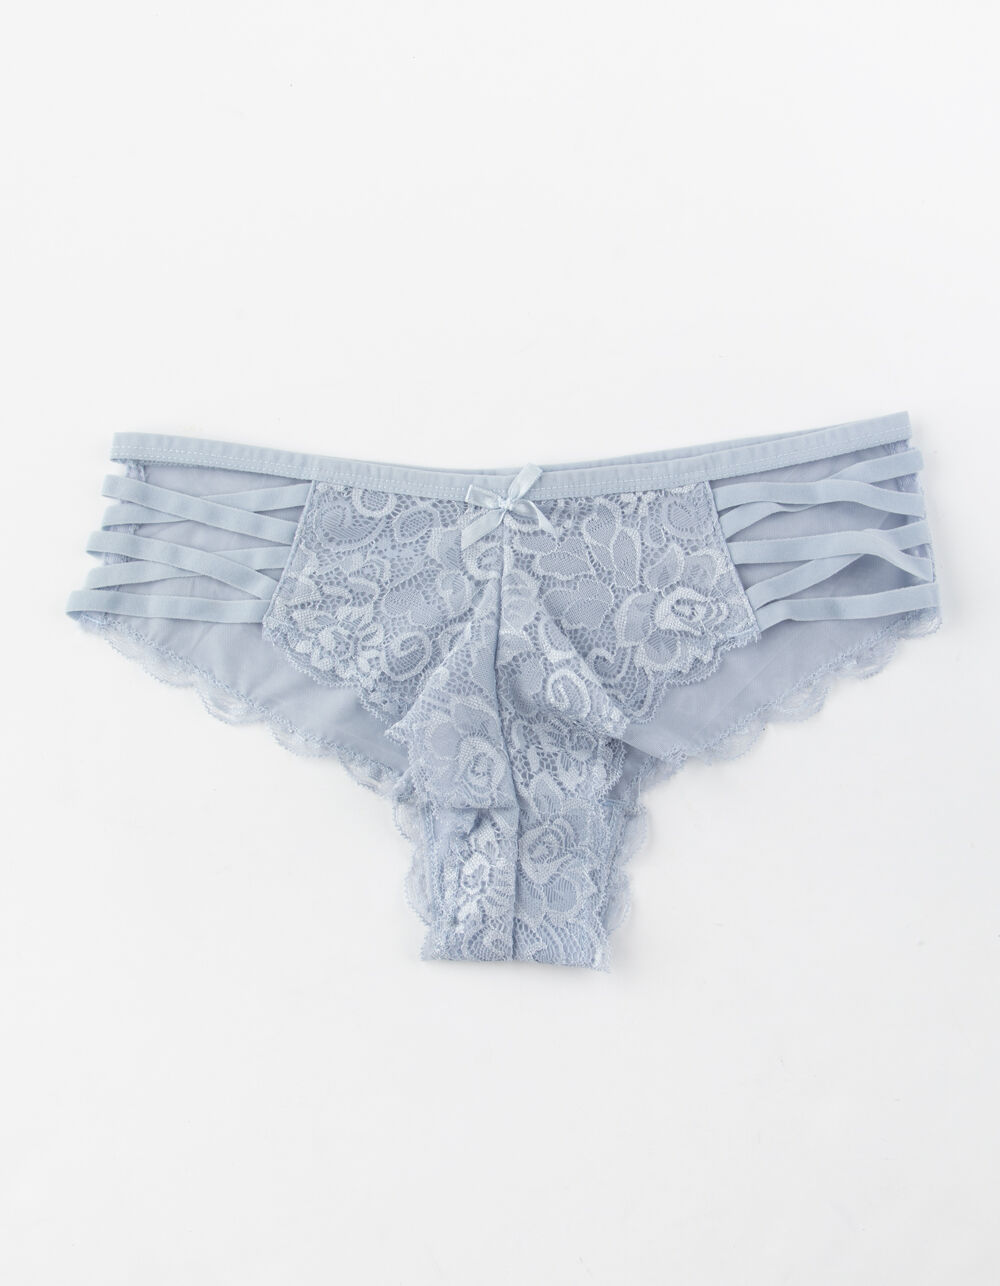 FULL TILT Everlasting Dreams Baby Blue Panties